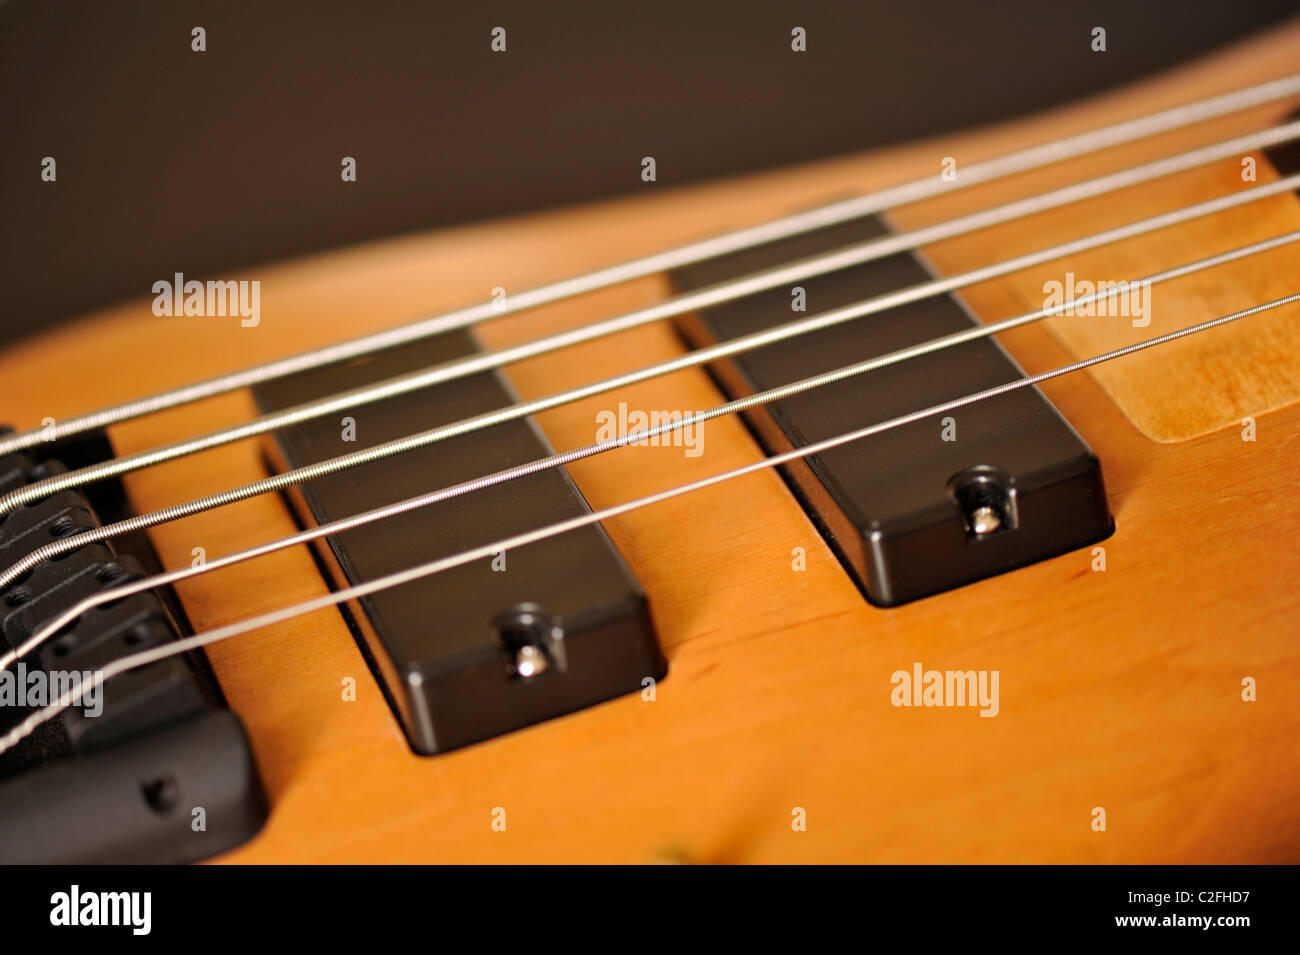 Guitar Pickups Too Close To Strings : strings guitar electric bass stock photos strings guitar electric bass stock images alamy ~ Russianpoet.info Haus und Dekorationen